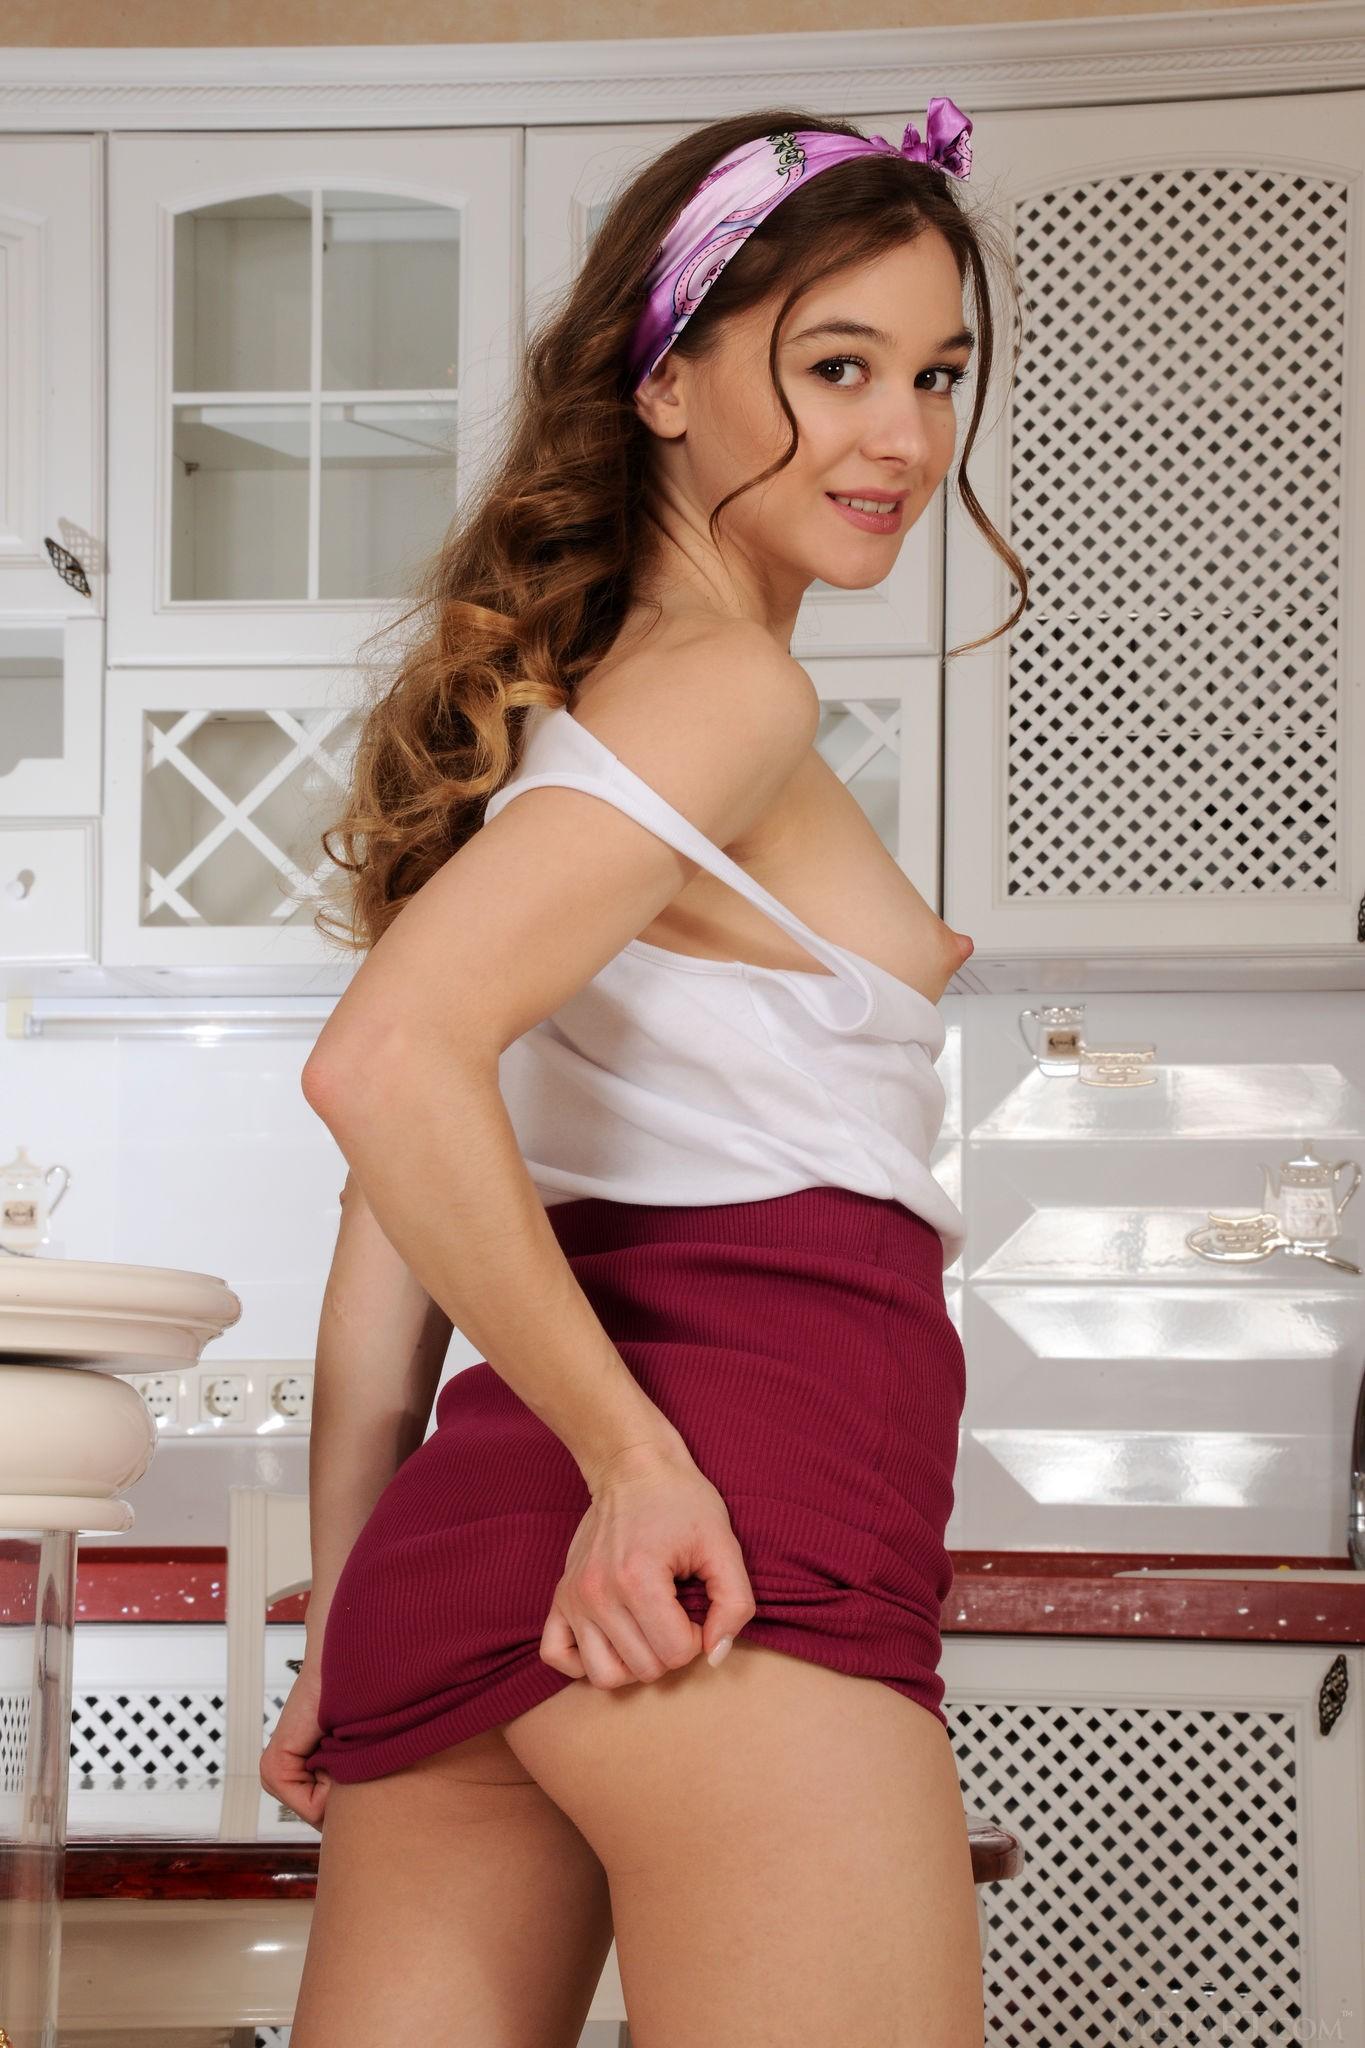 Шатенка снимает короткую юбку на кухне - фото